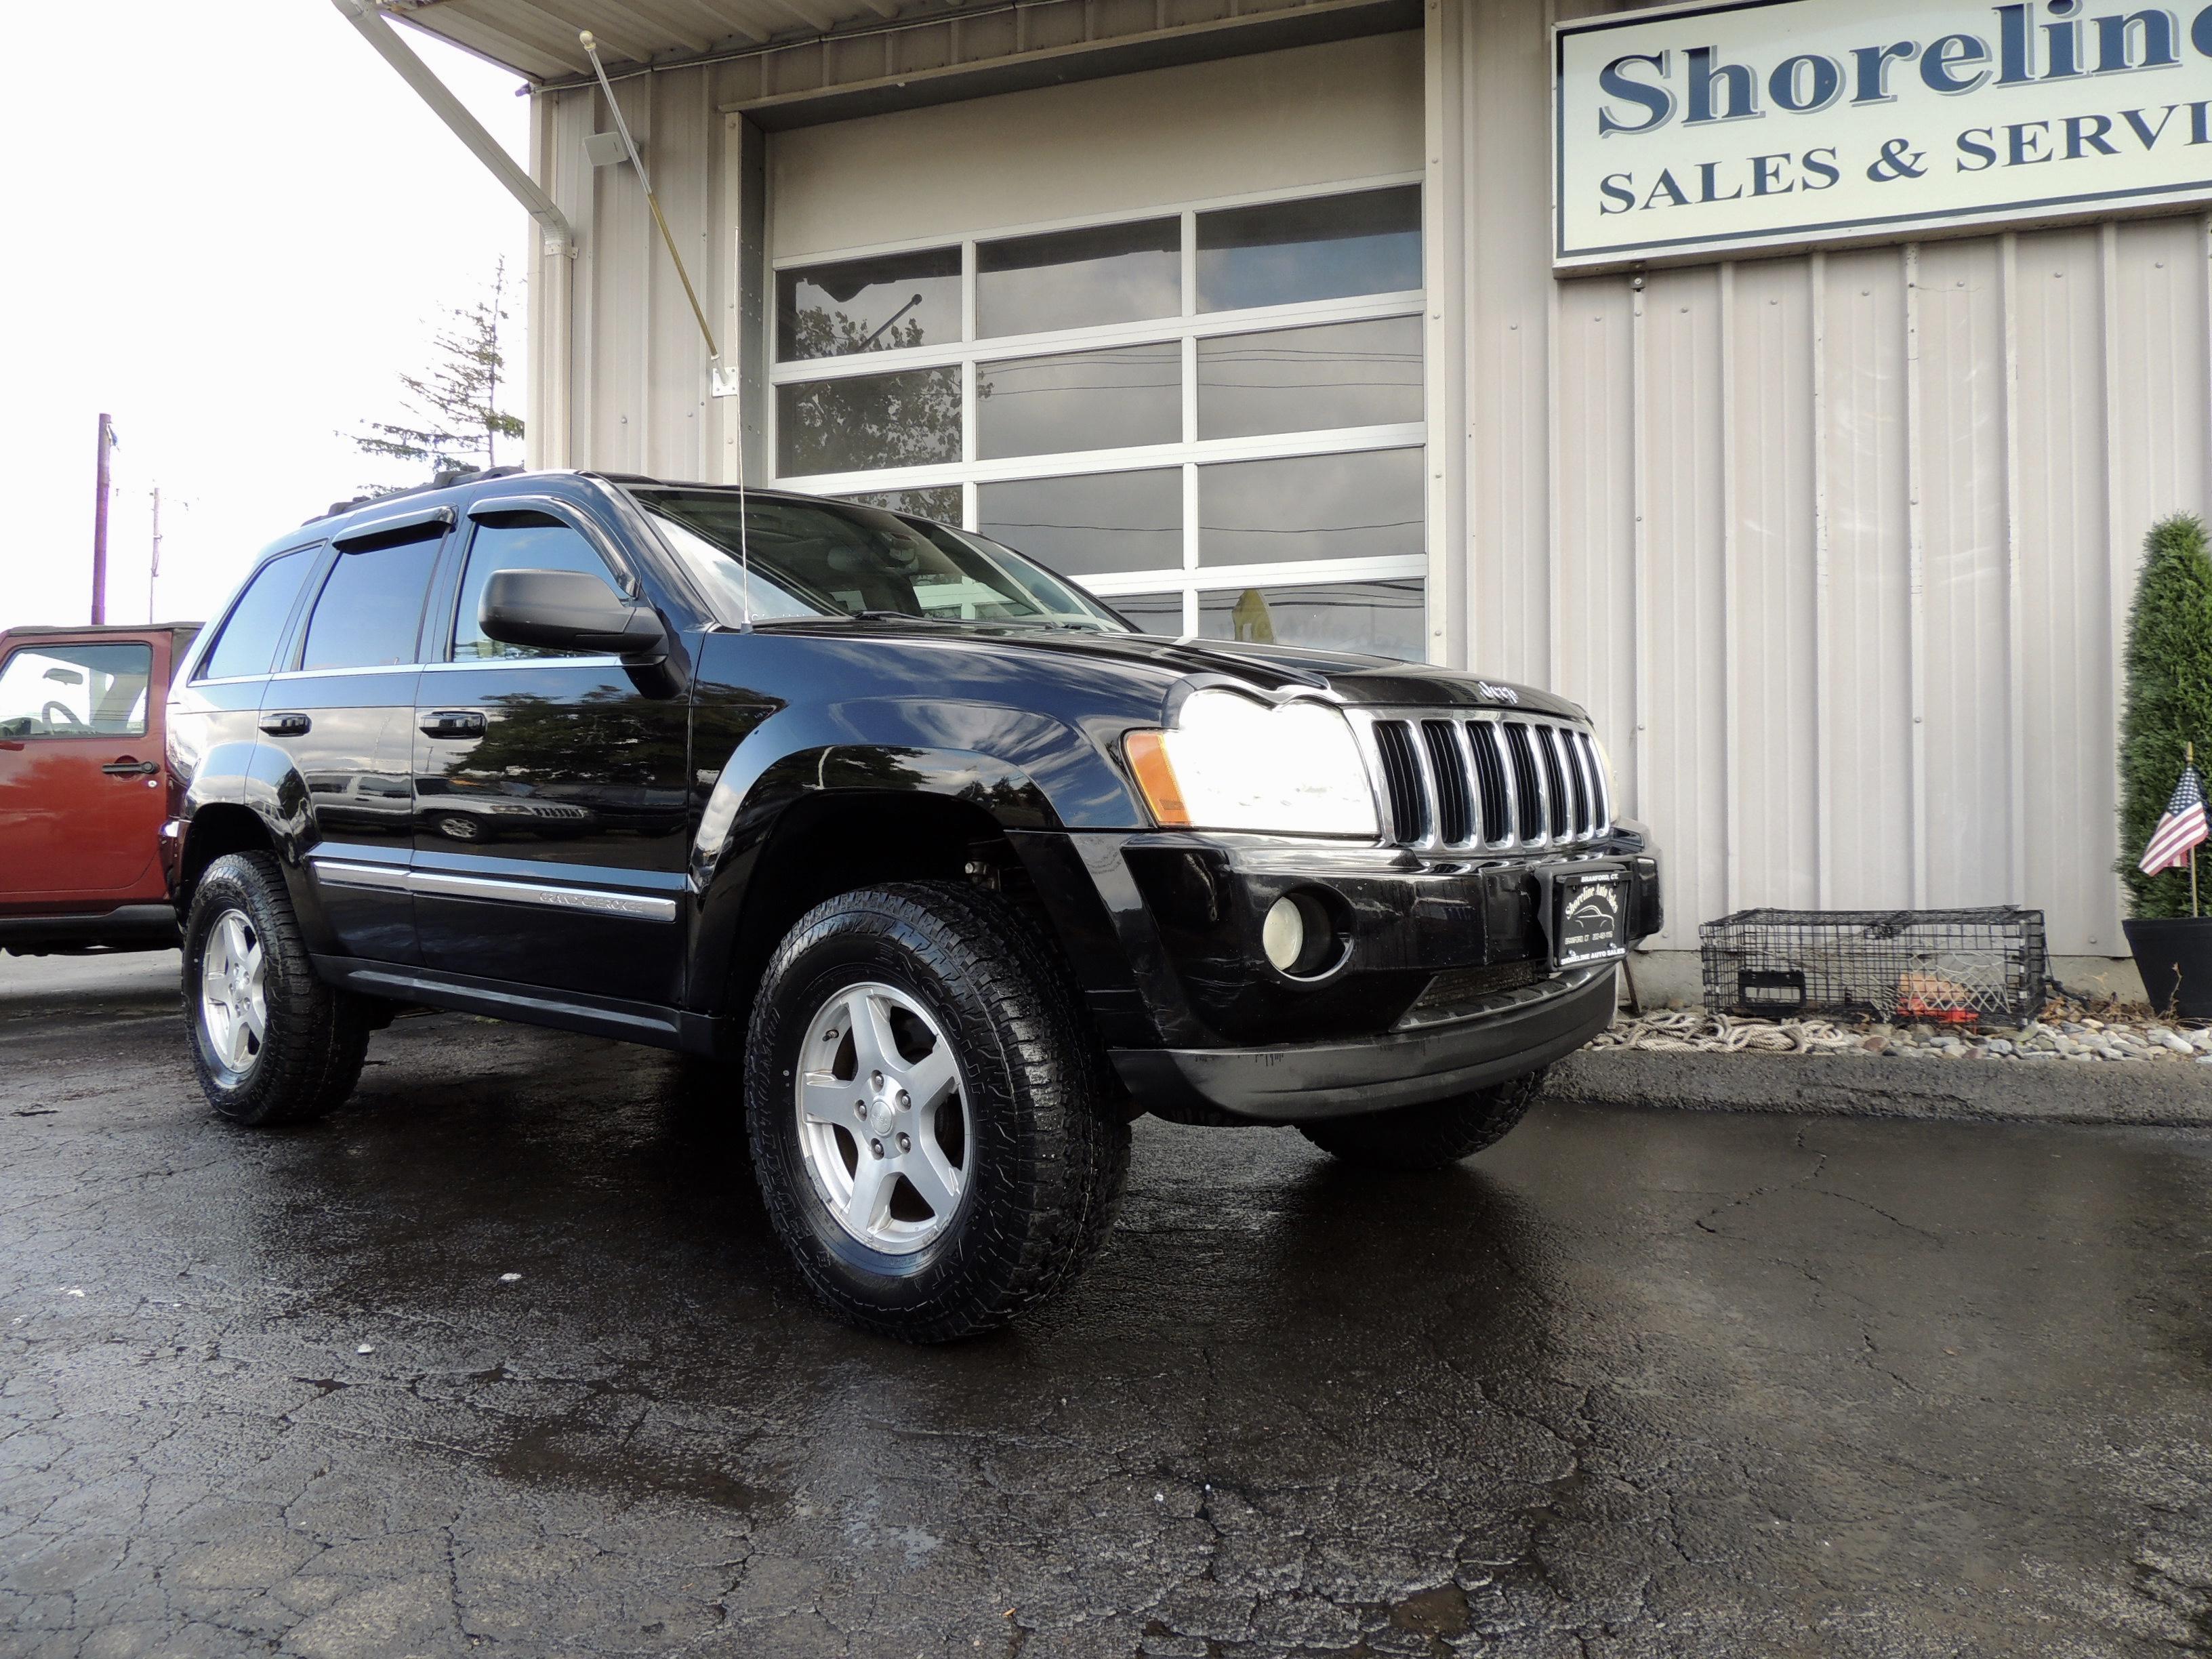 cherokee jeep grand hemi 2006 limited edition tires oversized lift shoreline auto